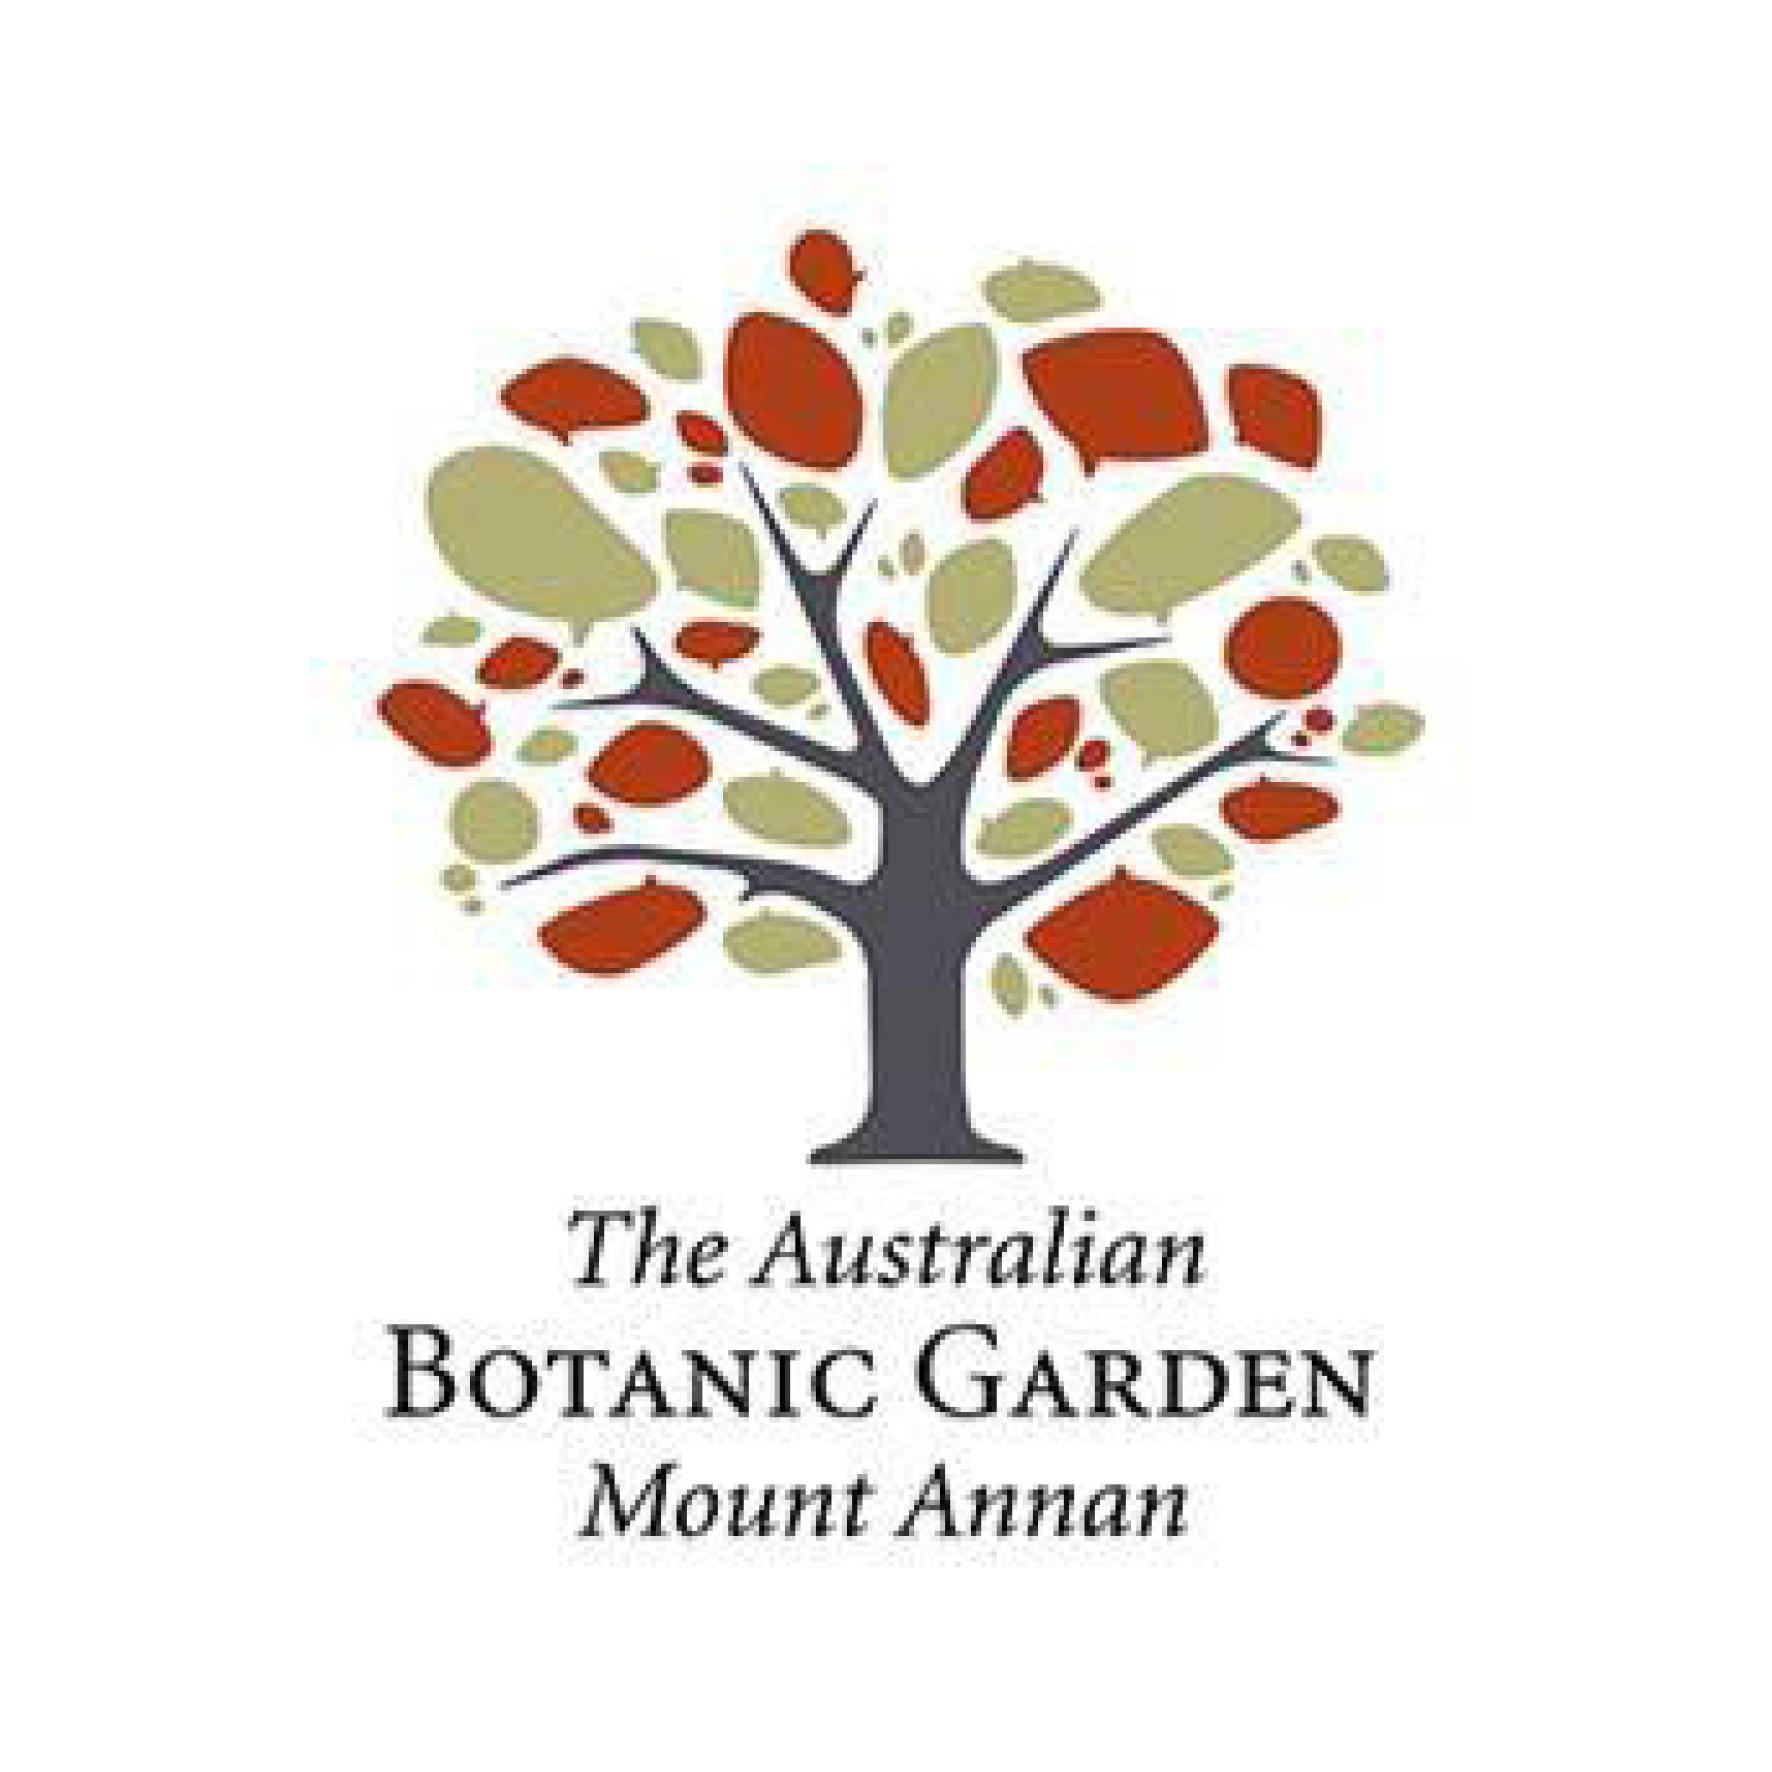 Australian botanic garden mount annan wedding invitations